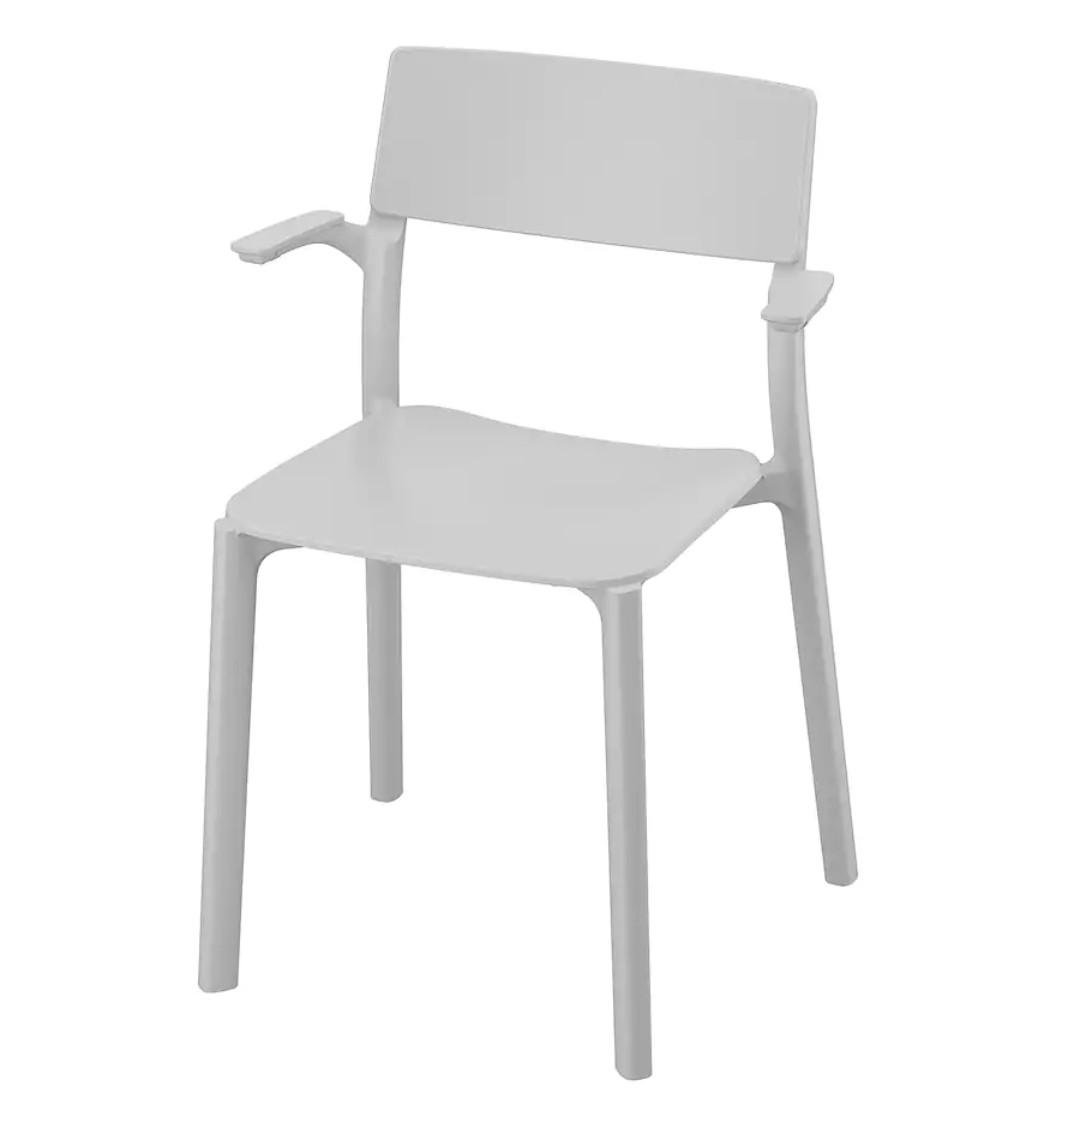 Ikea Janinge Dinning Chairs